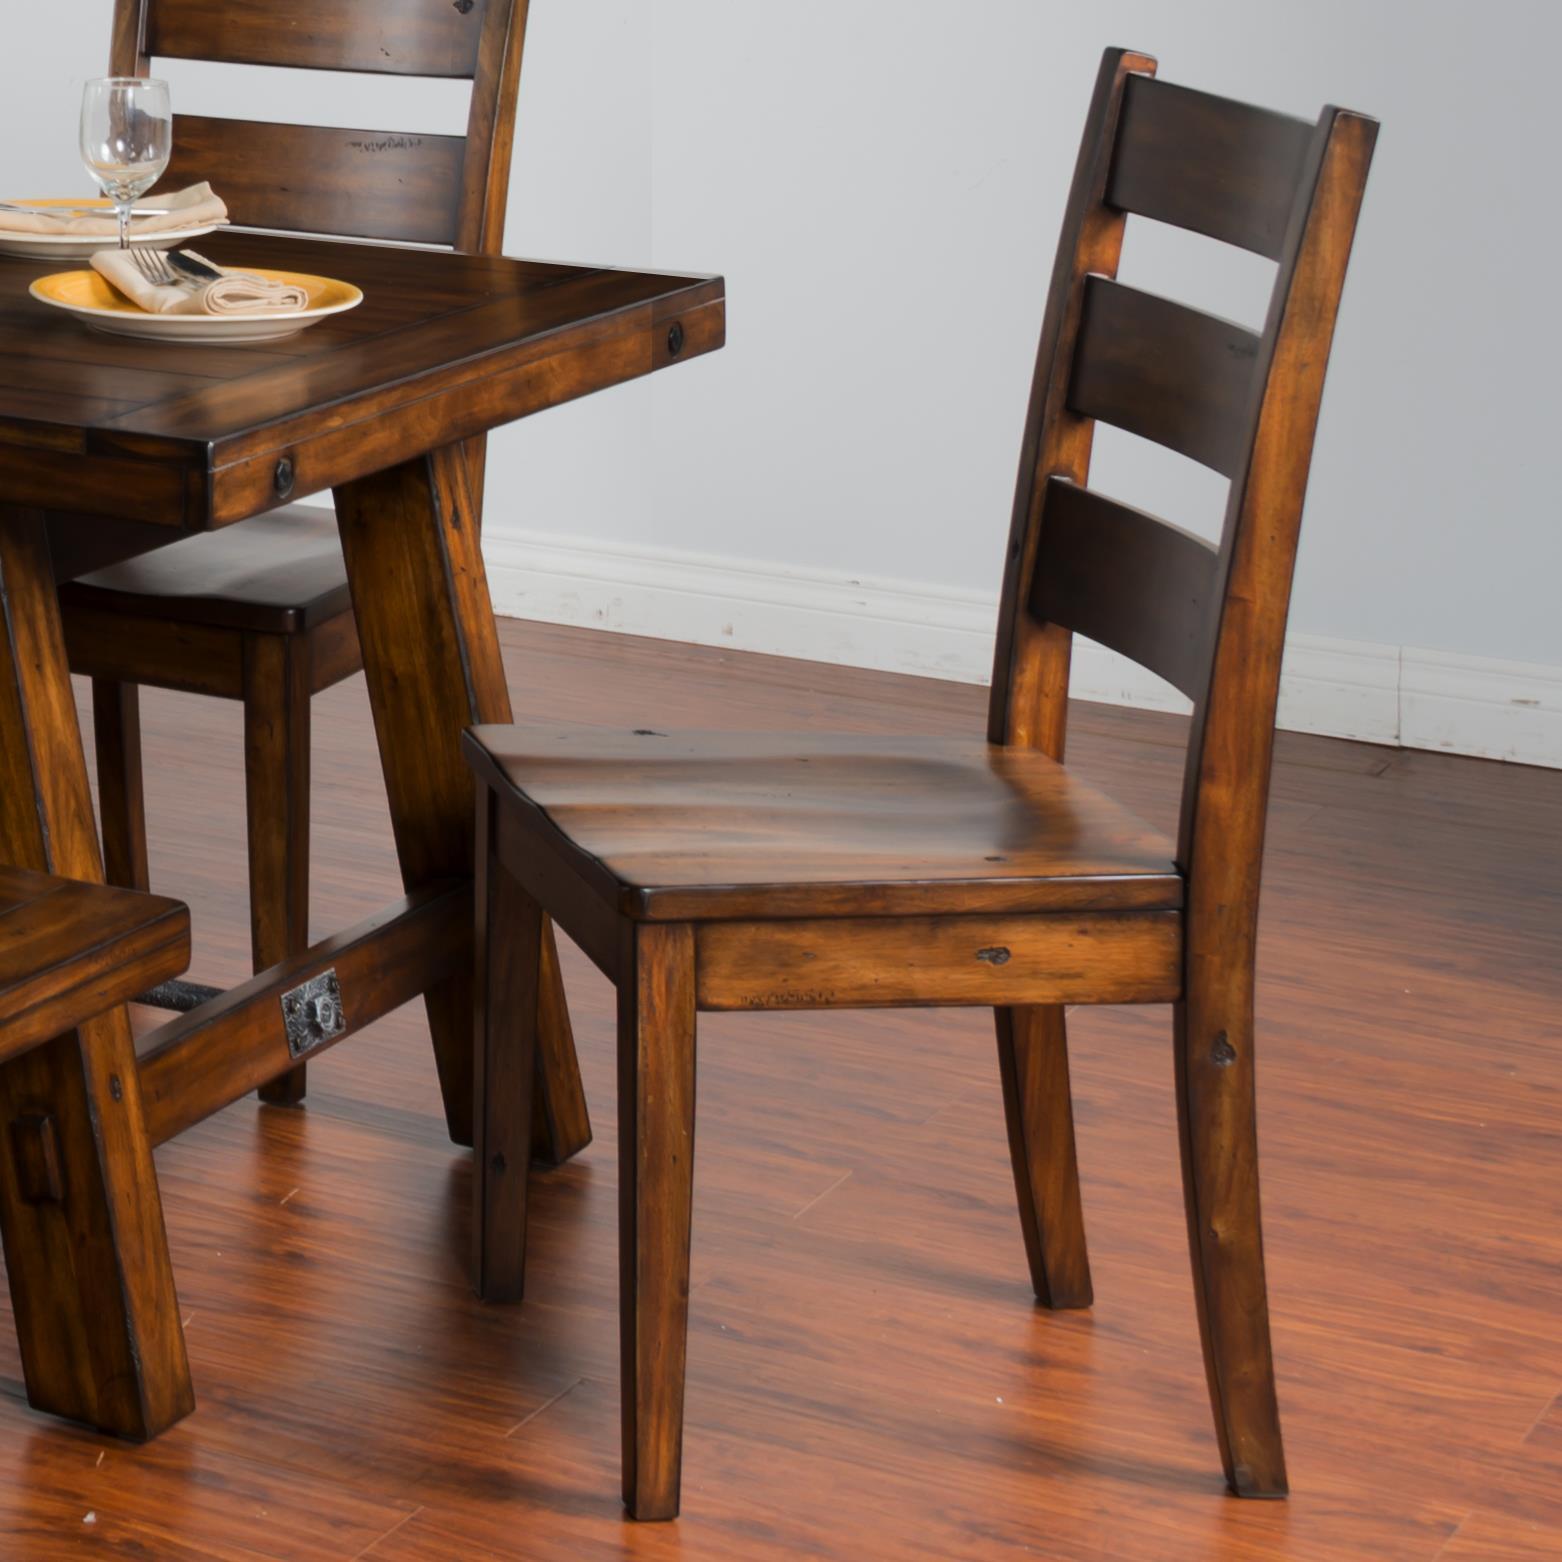 Great Distressed Mahogany Ladderback Chair W/ Wood Seat